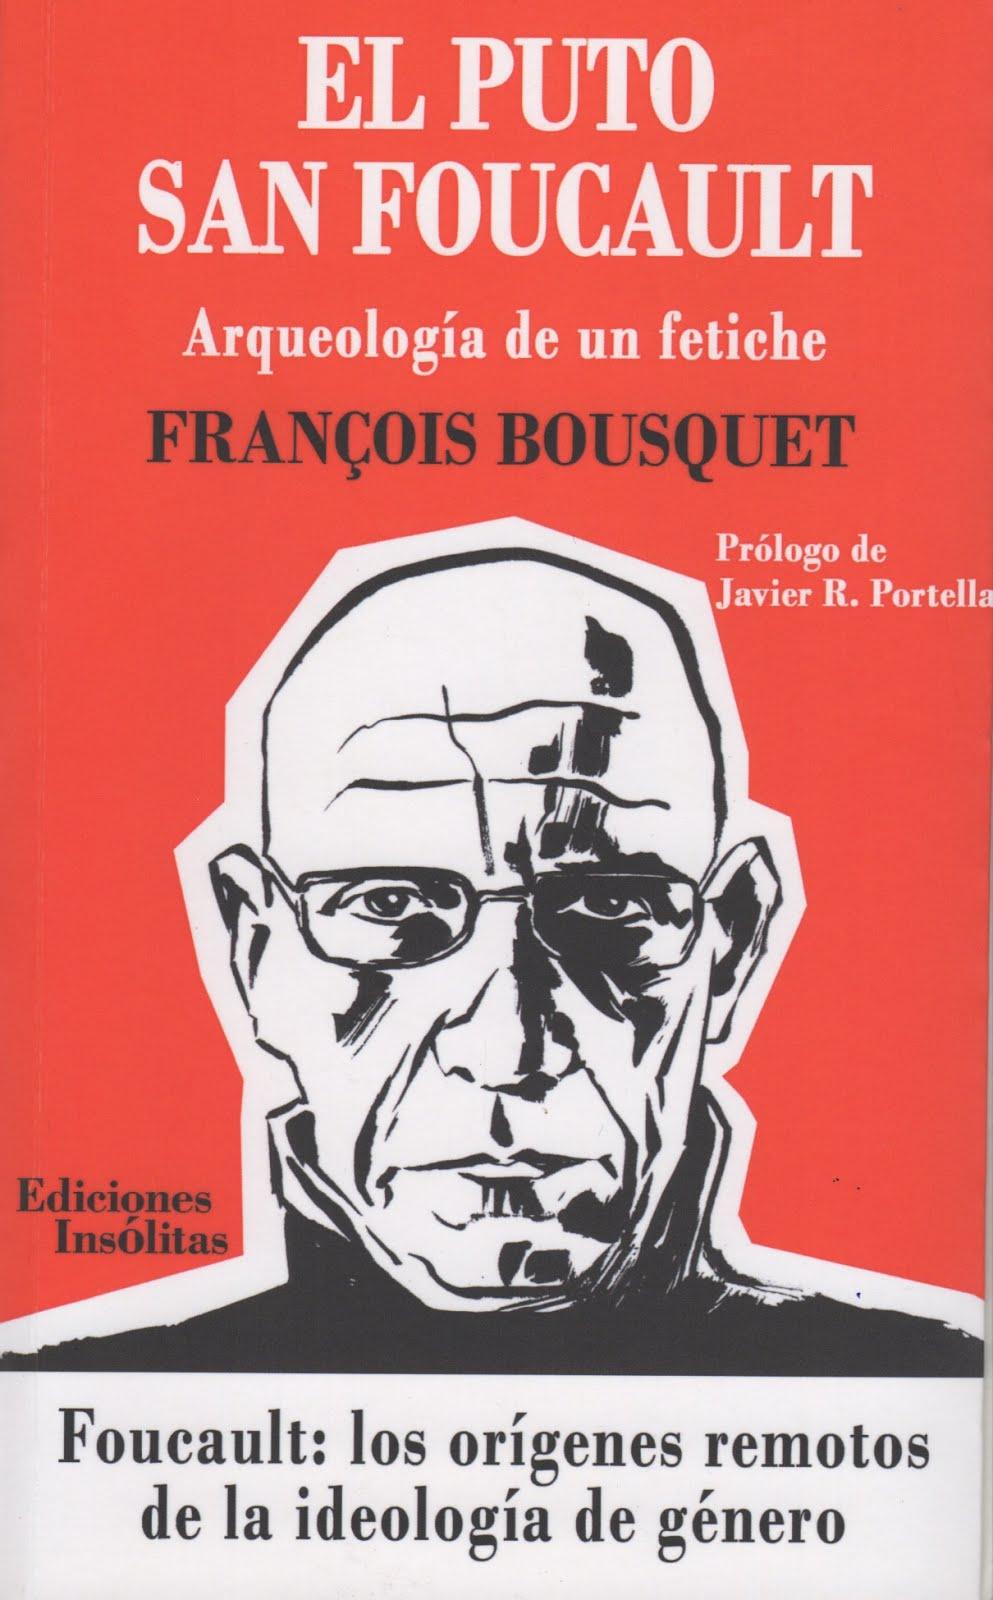 François Bousquet (El puto san Foucault) Arqueología de un fetiche